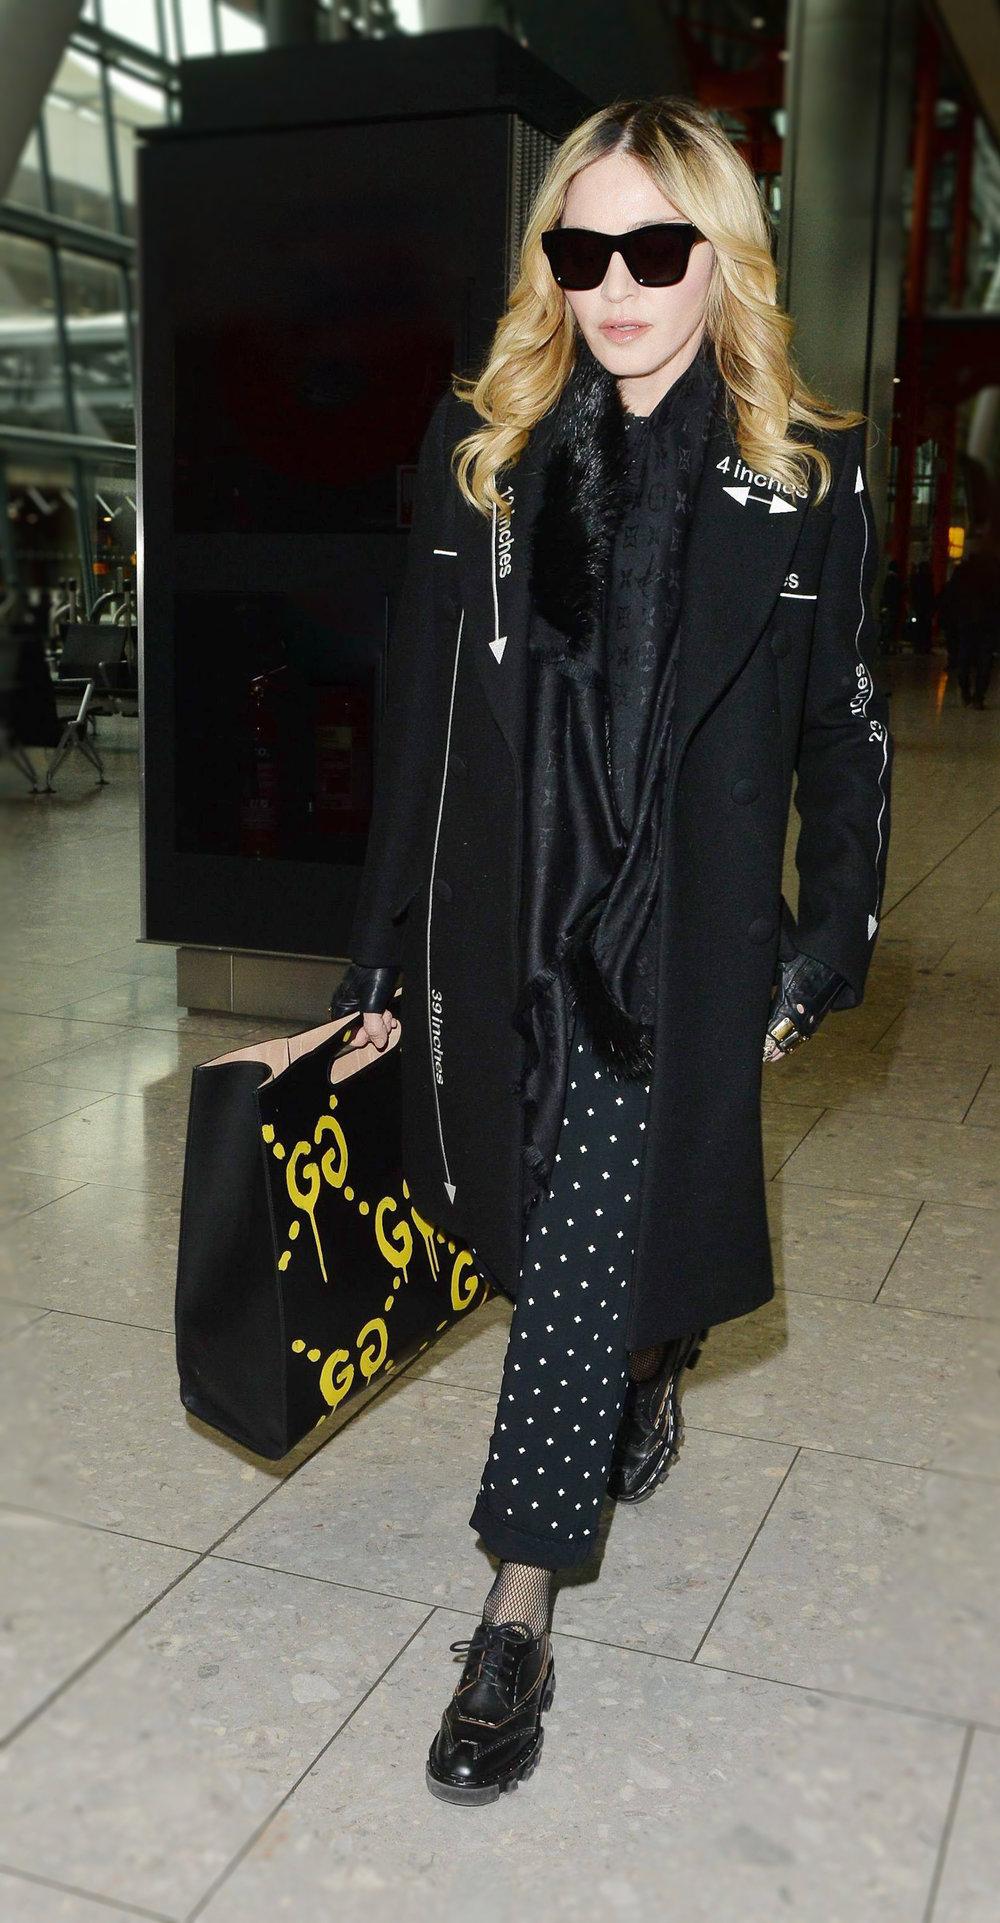 Madonna_Olycom#99-848548-000015_expires 08.04.17_revised.jpg